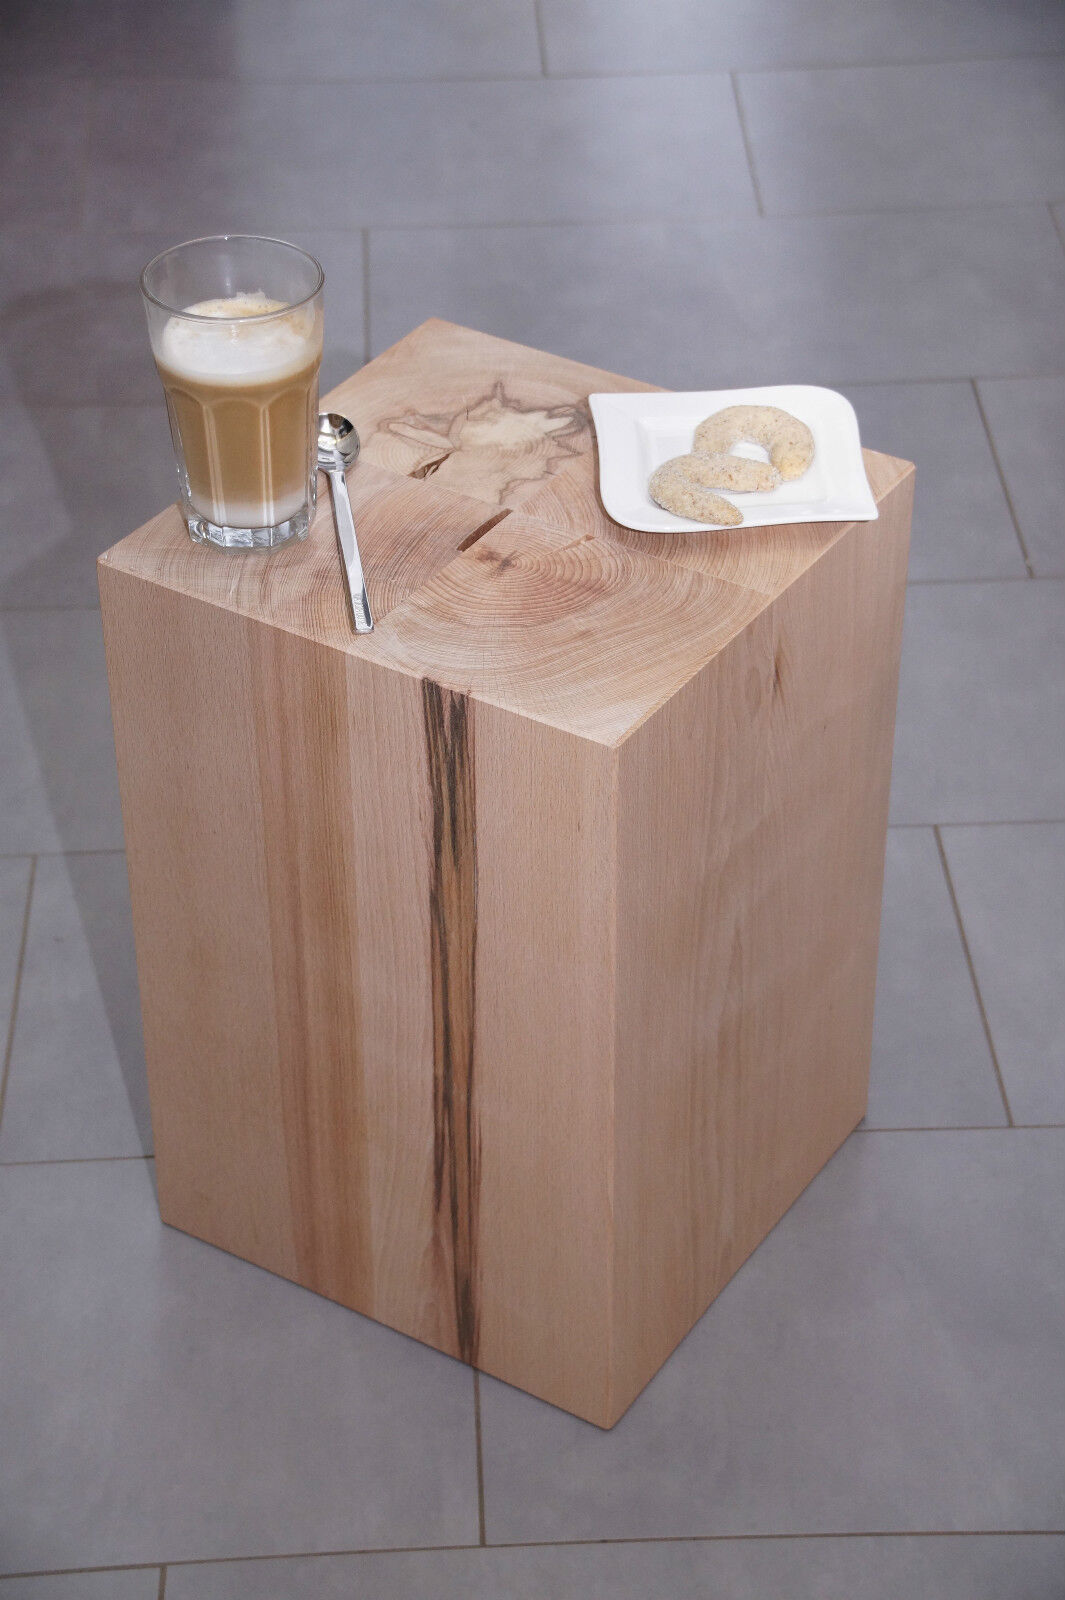 sitzblock holz block sitzhocker buche tisch hocker w rfel ma iv 45x30x30 cm eur 110 00. Black Bedroom Furniture Sets. Home Design Ideas